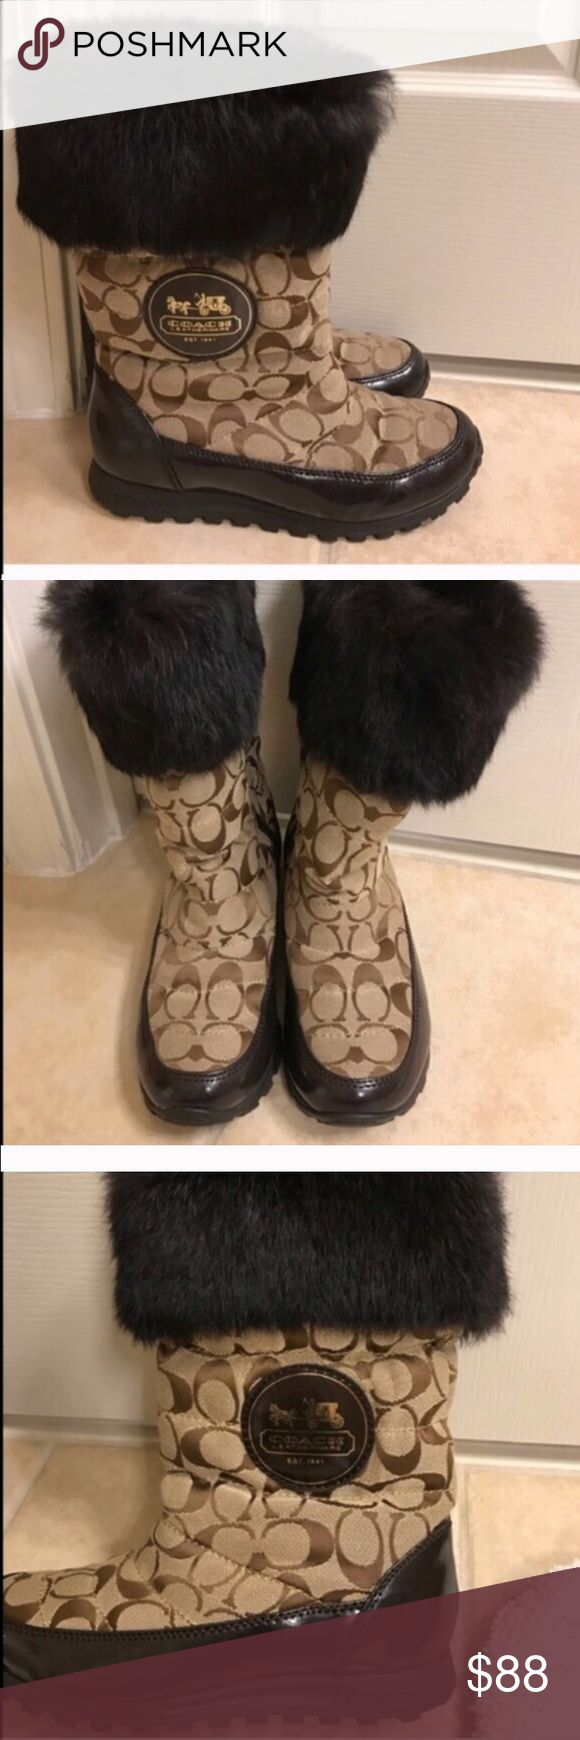 Authentic Coach size 6 brown winter rain boots Authentic Coach size 6 brown winter rain boots Coach Shoes Winter & Rain Boots